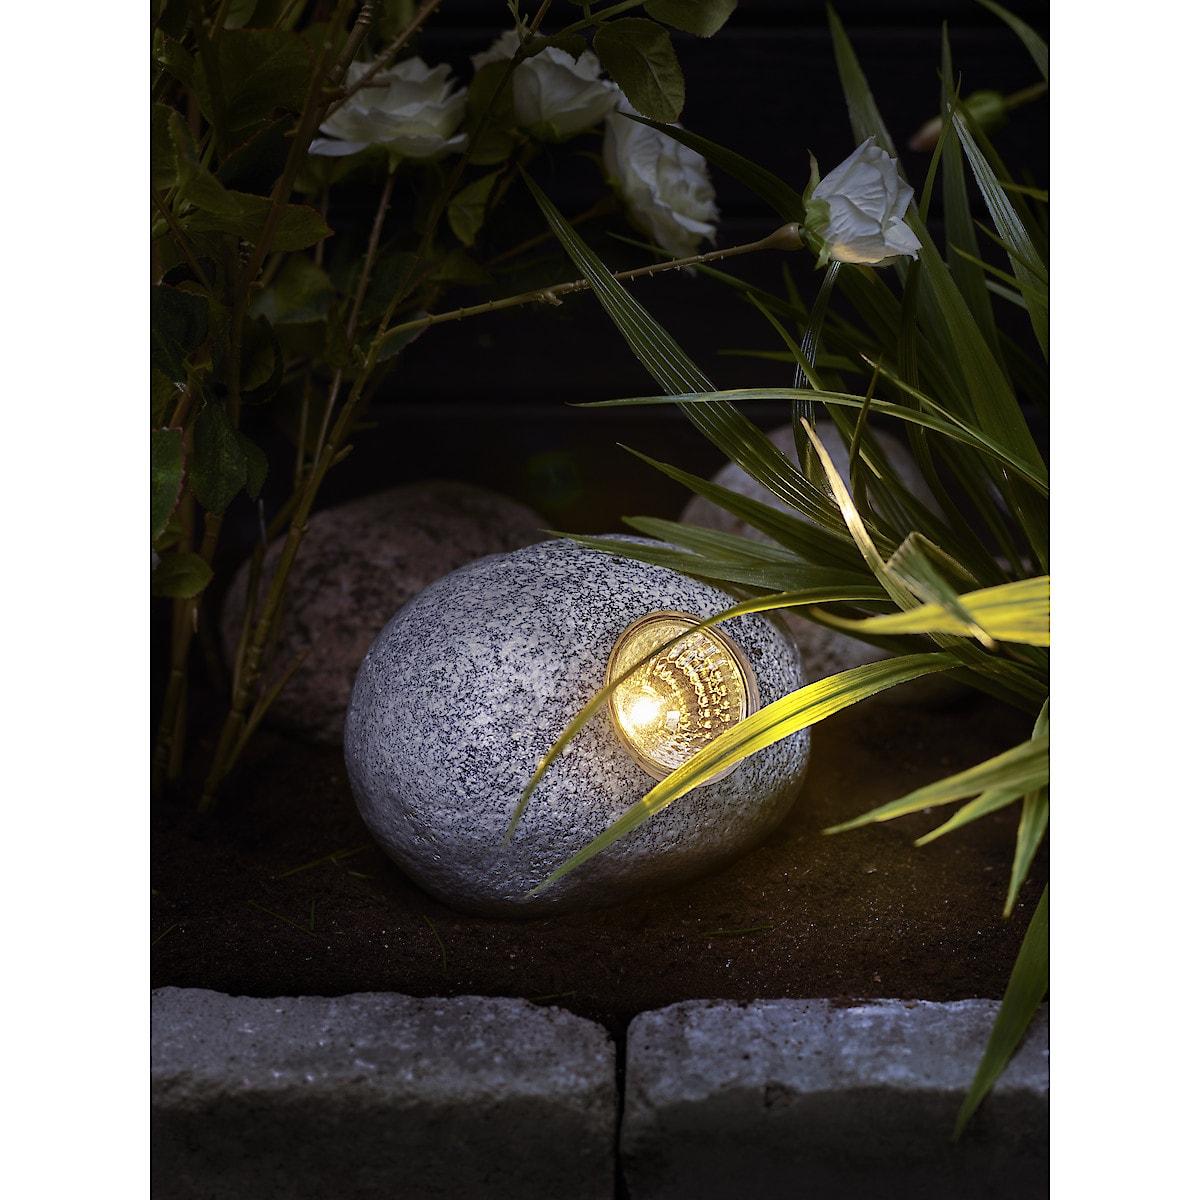 Stein med solcellebelysning